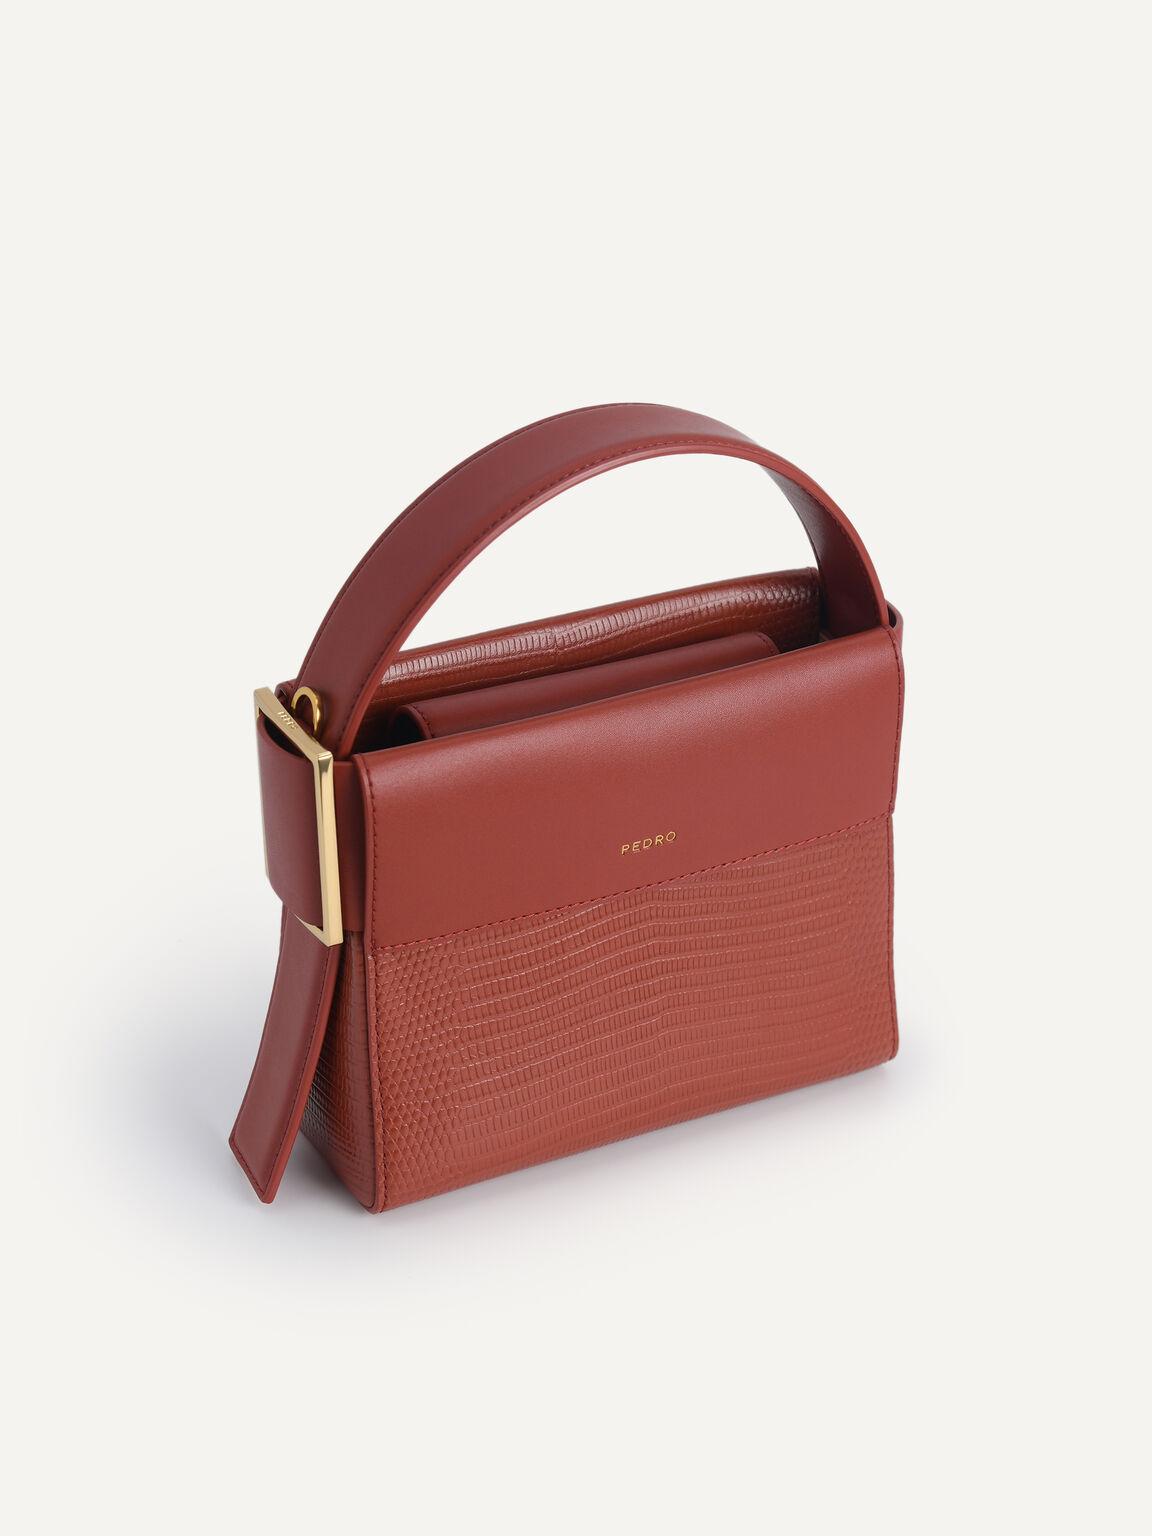 Lizard-Effect Leather Mini Bag, Brick, hi-res